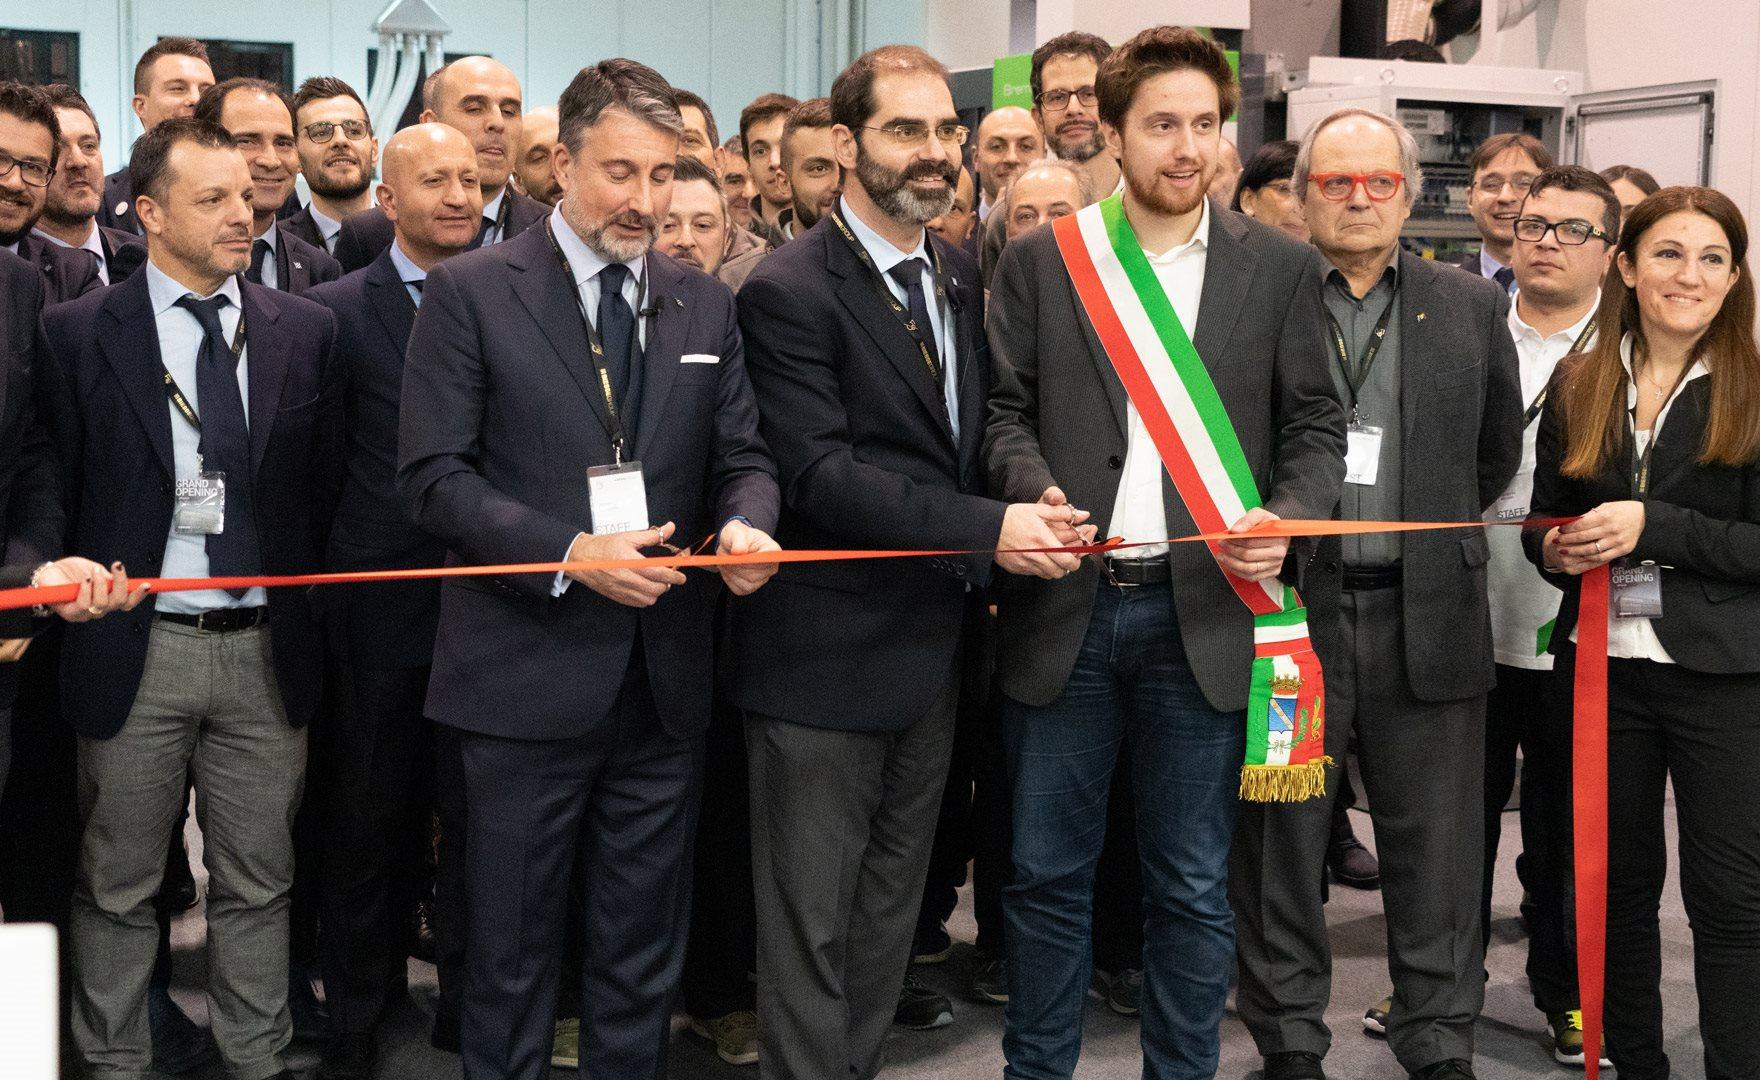 Biesse inaugura la nuova sede in Brianza